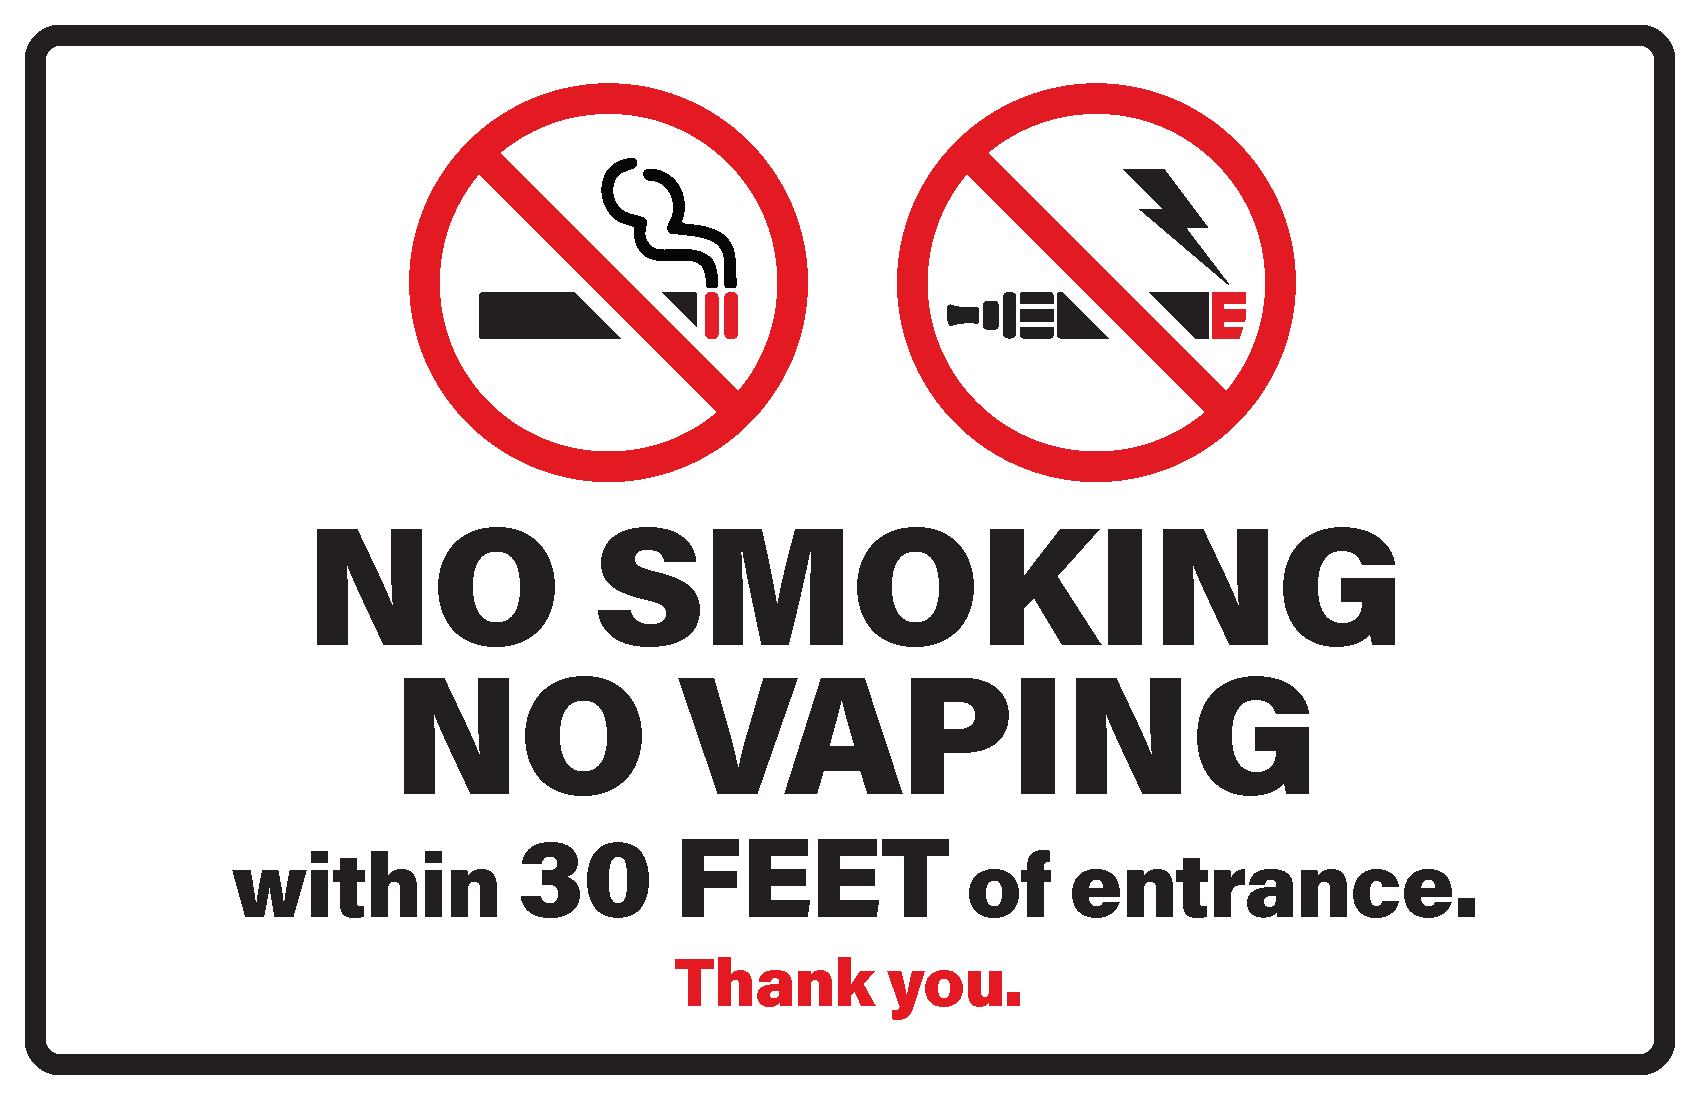 Tobacco Free Public Places - Get Healthy Clark County